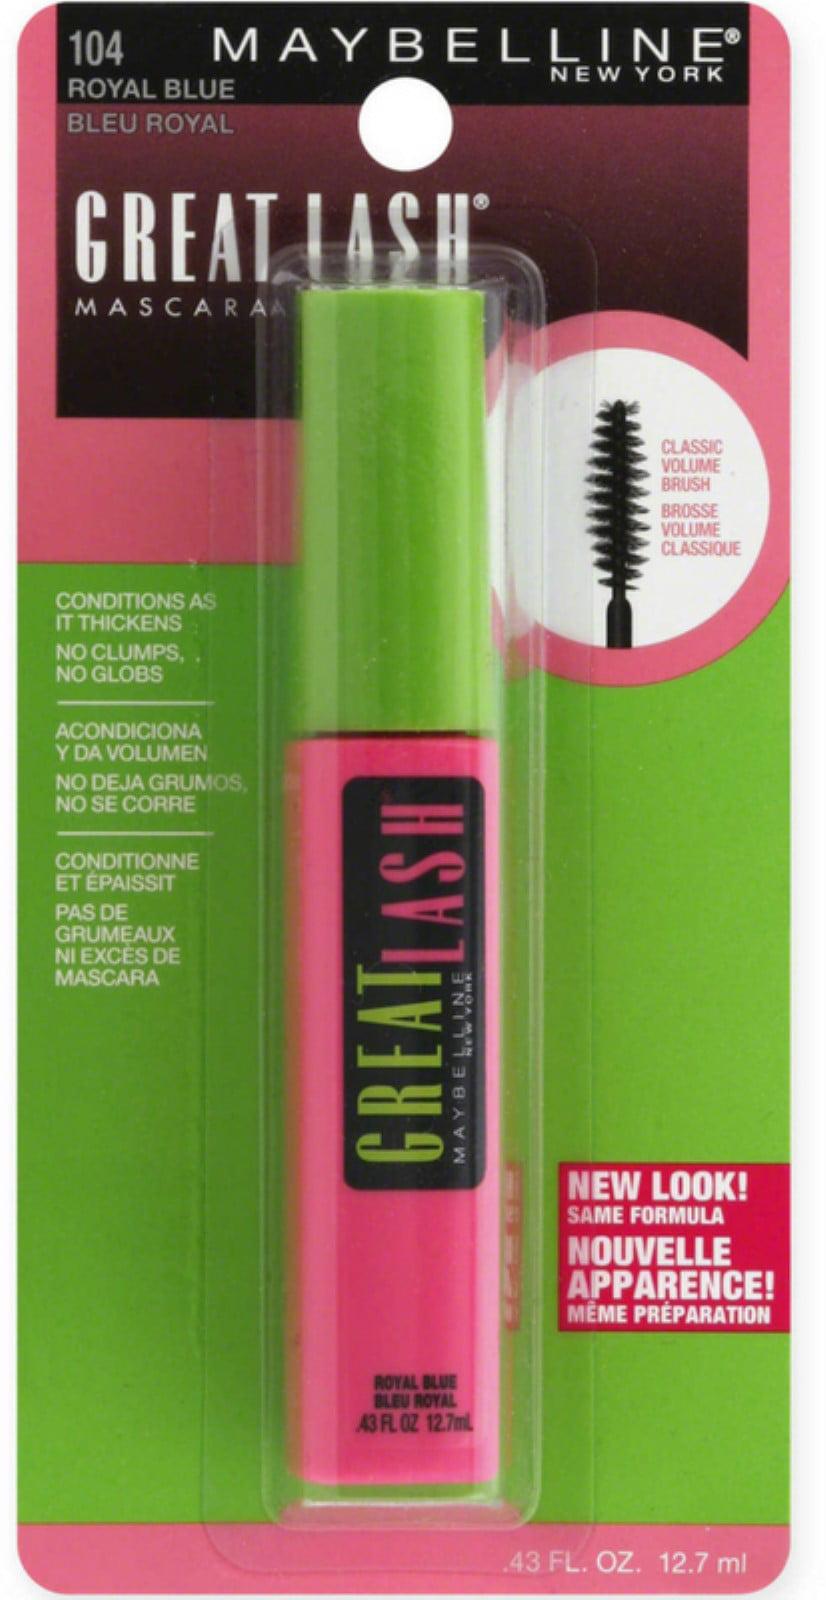 11818543788 2 Pack - Maybelline Great Lash Washable Mascara, Royal Blue [104] 0.43 oz -  Walmart.com